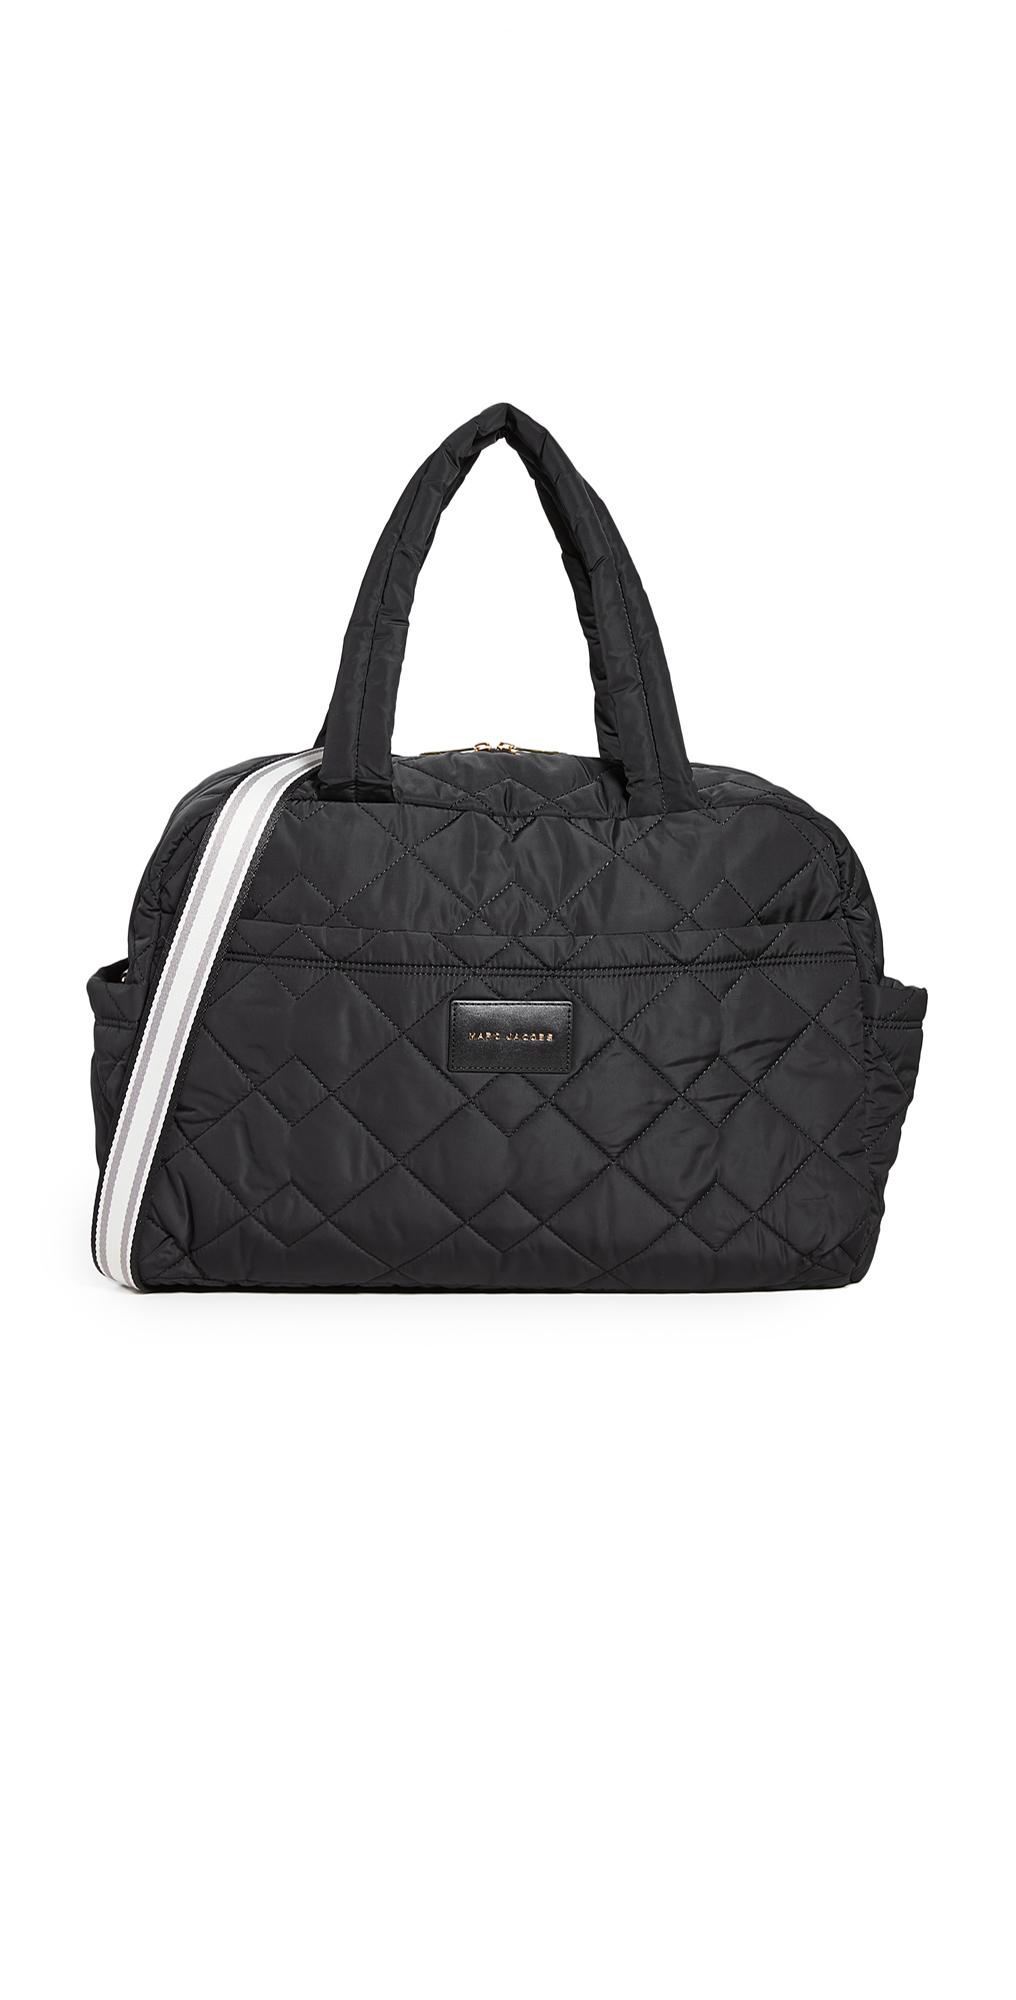 The Marc Jacobs Large Weekender Duffle Bag